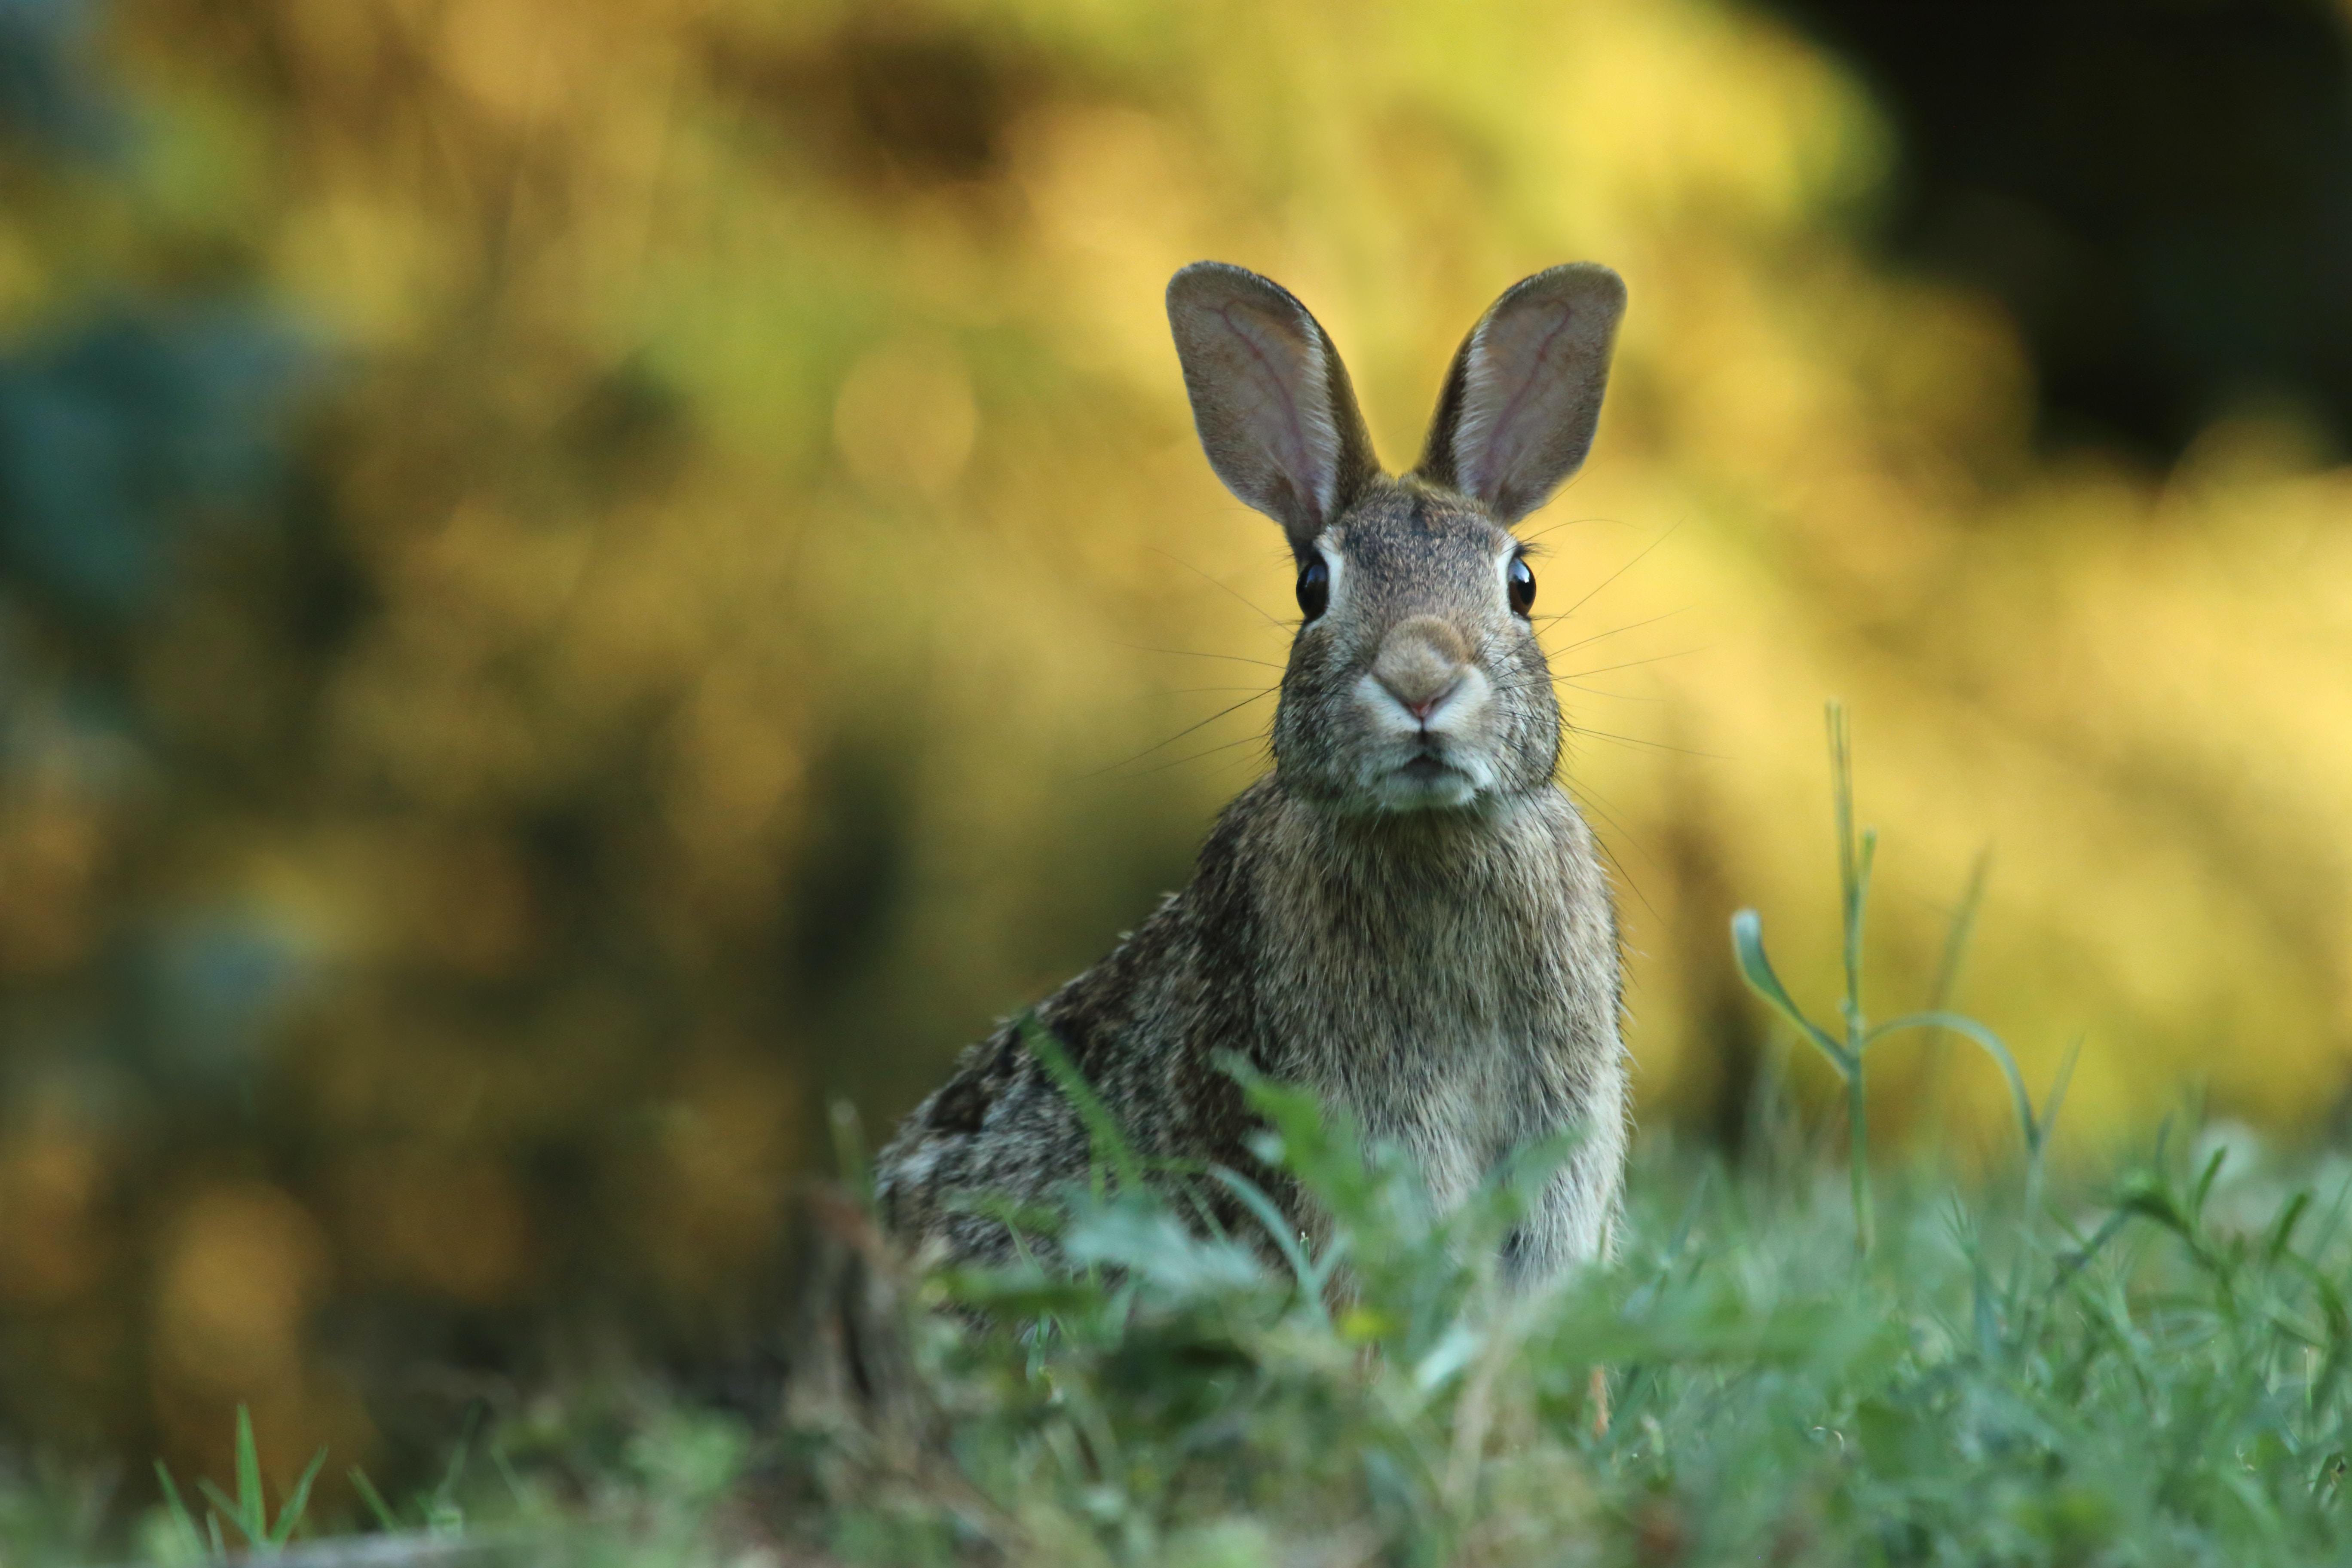 Portrait of a wild rabbit alert of predators in a field